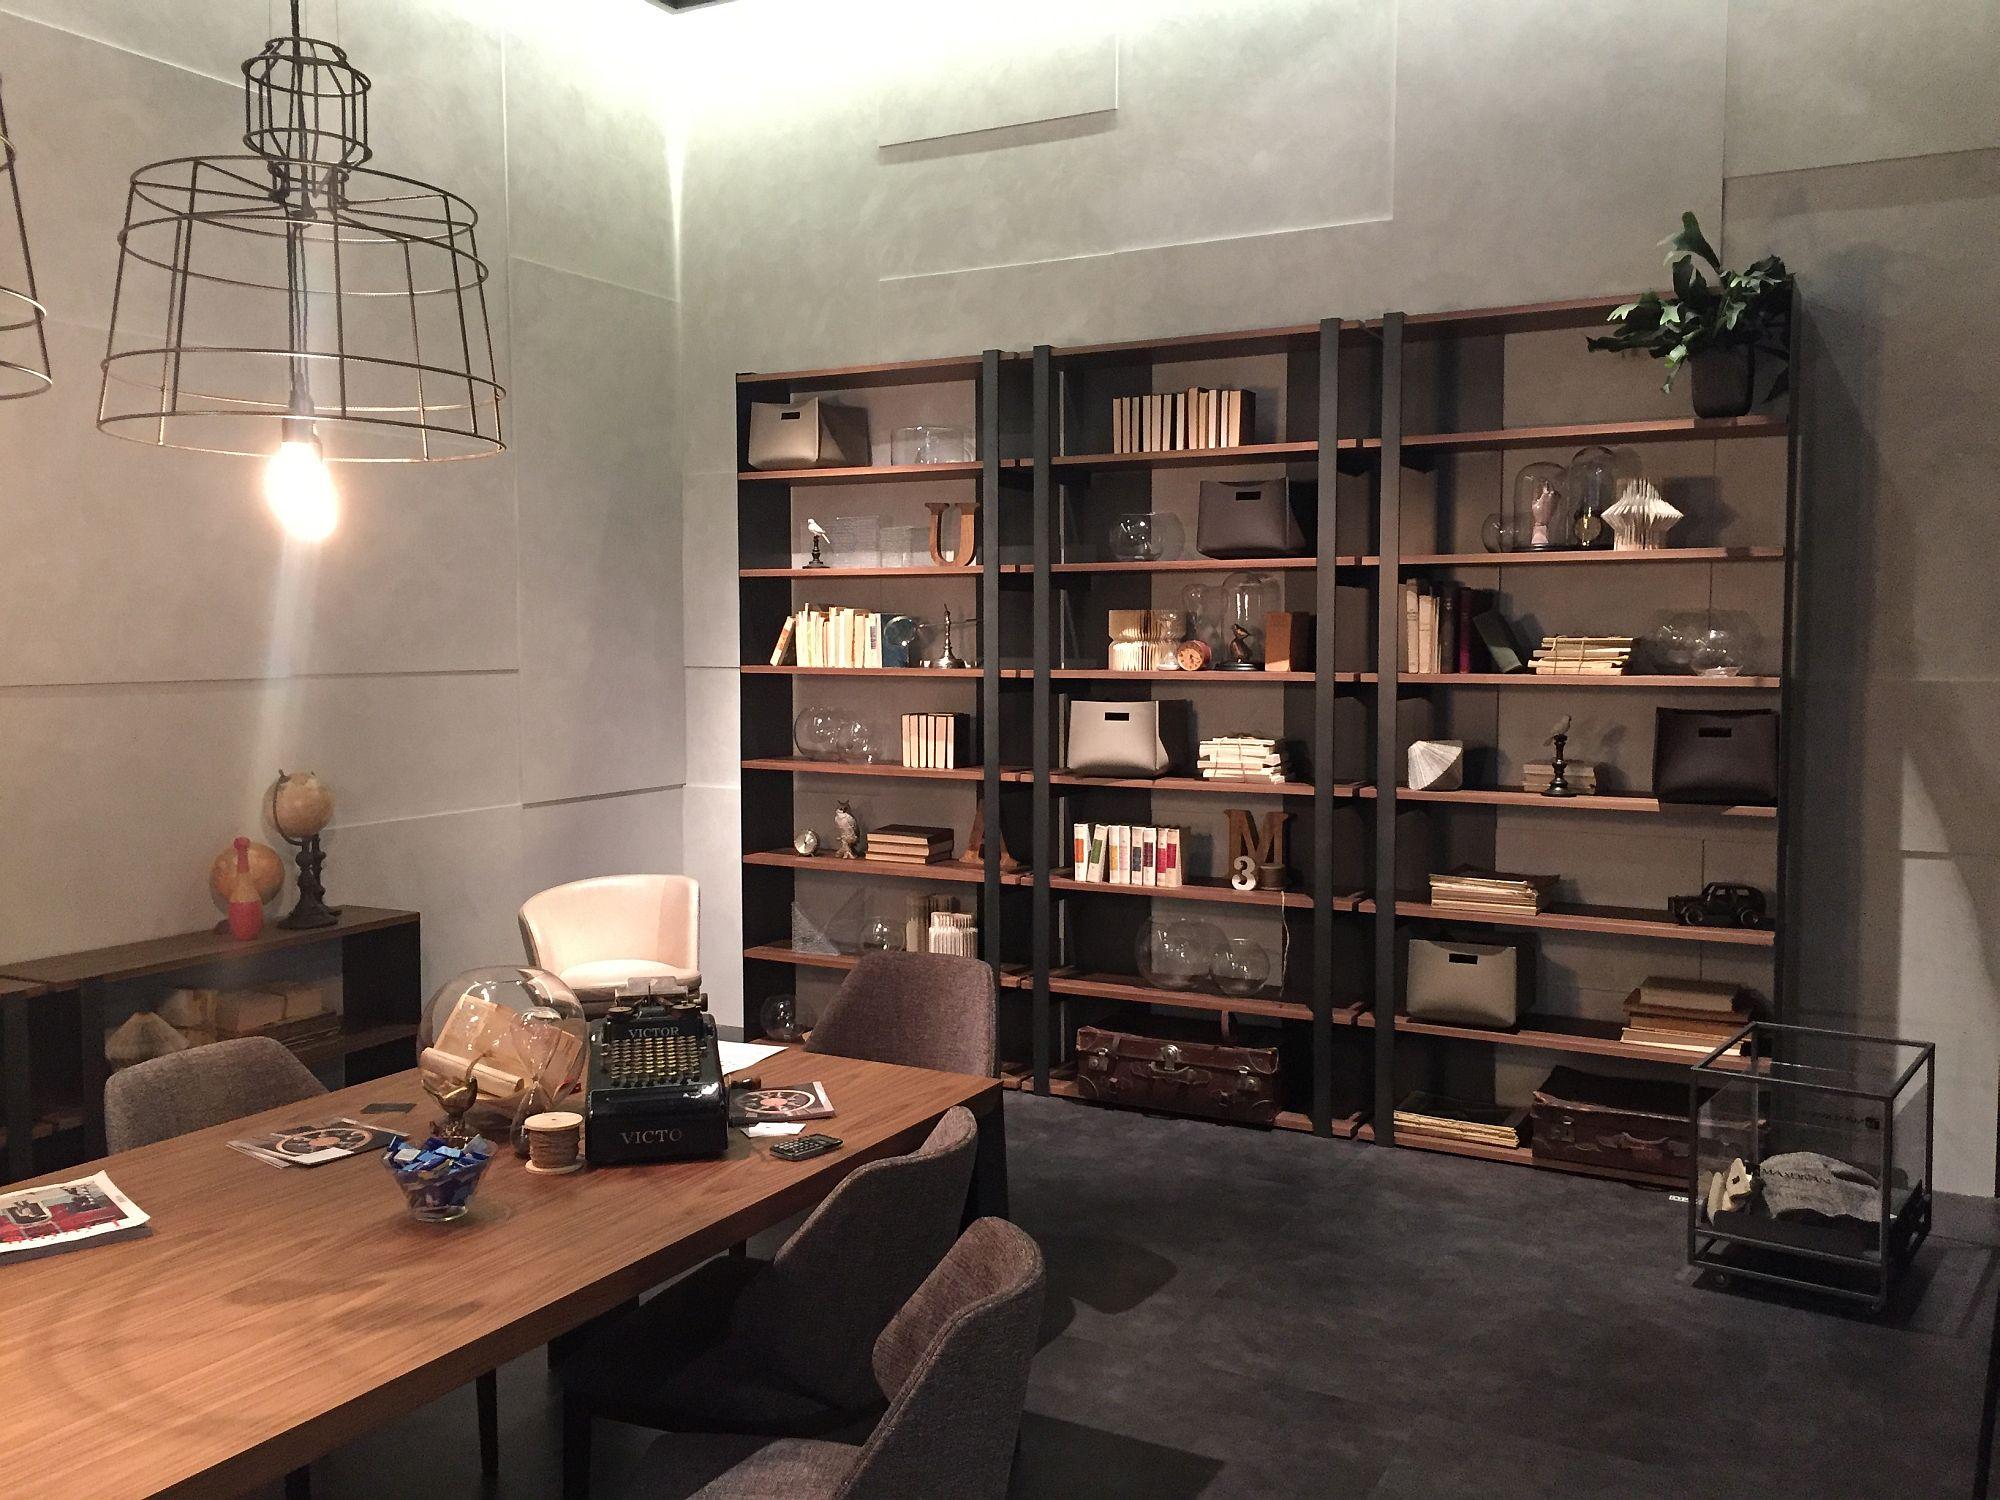 Home office open bookshelf offers plenty of display space